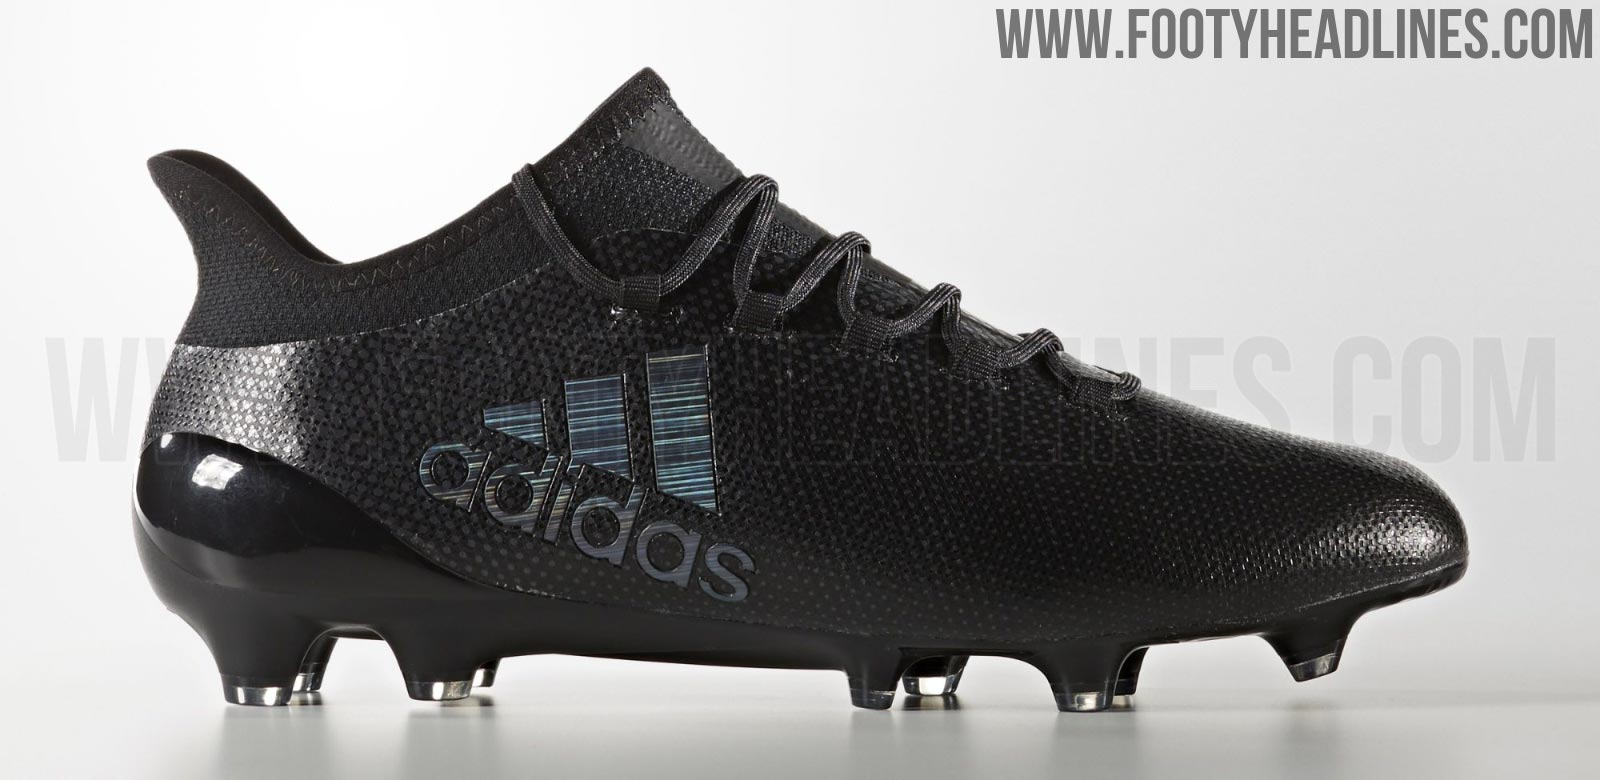 adidas x 17.1 core black